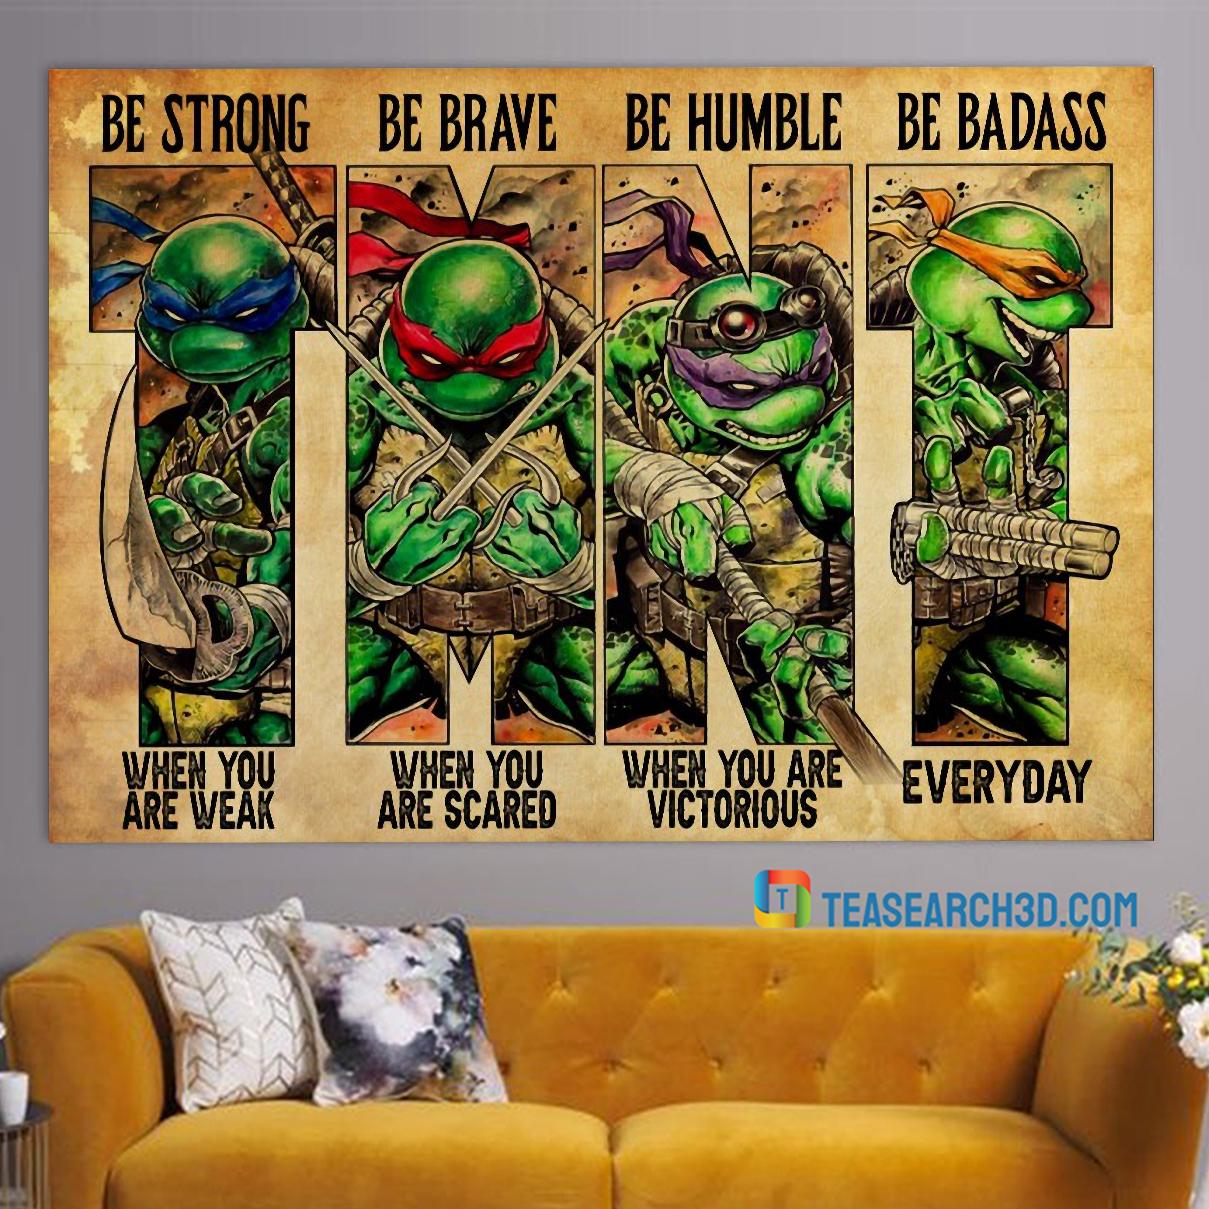 Teenage Mutant Ninja Turtles be strong poster